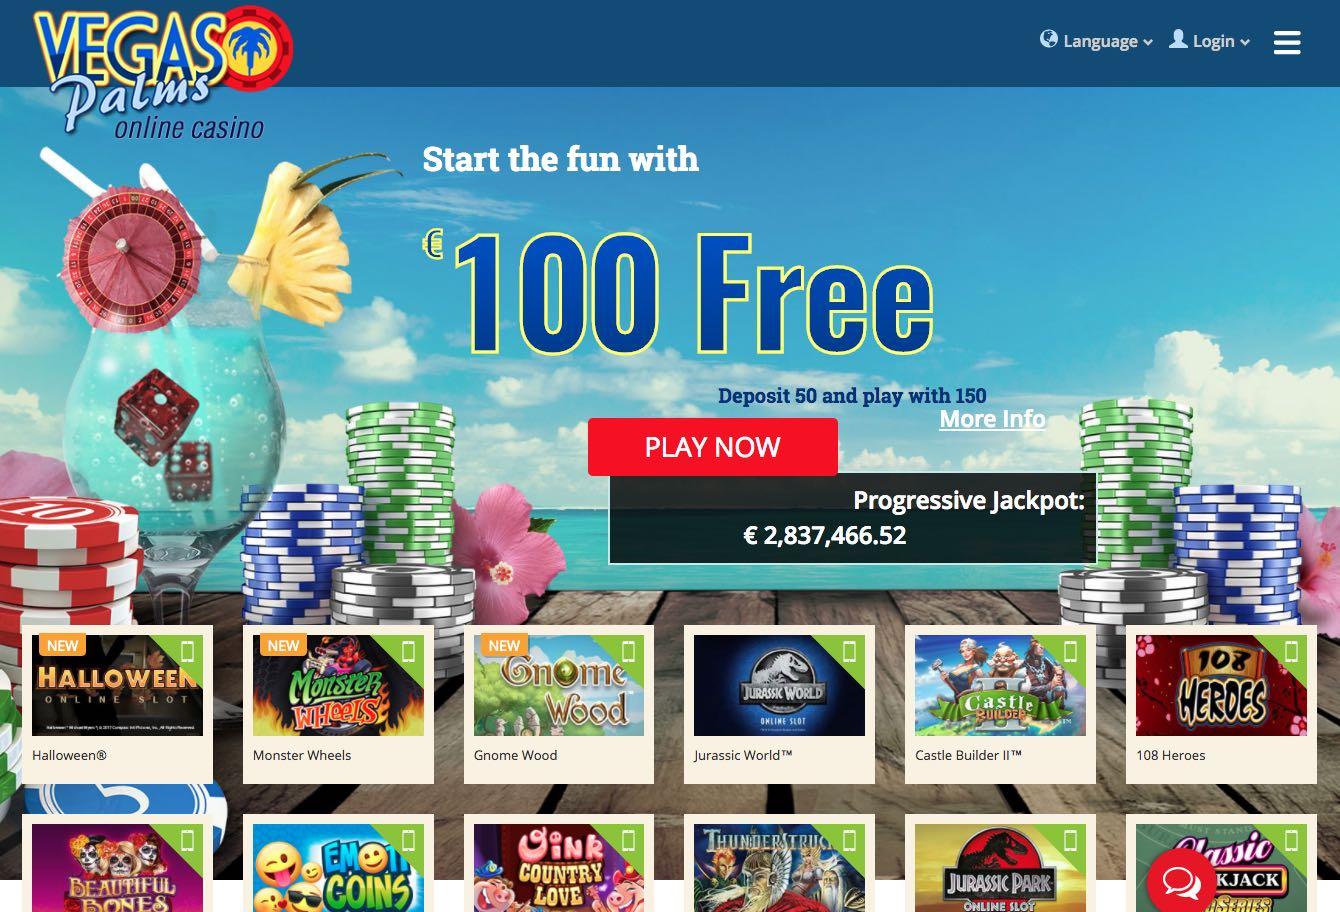 Vegas Palms Online Casino Download